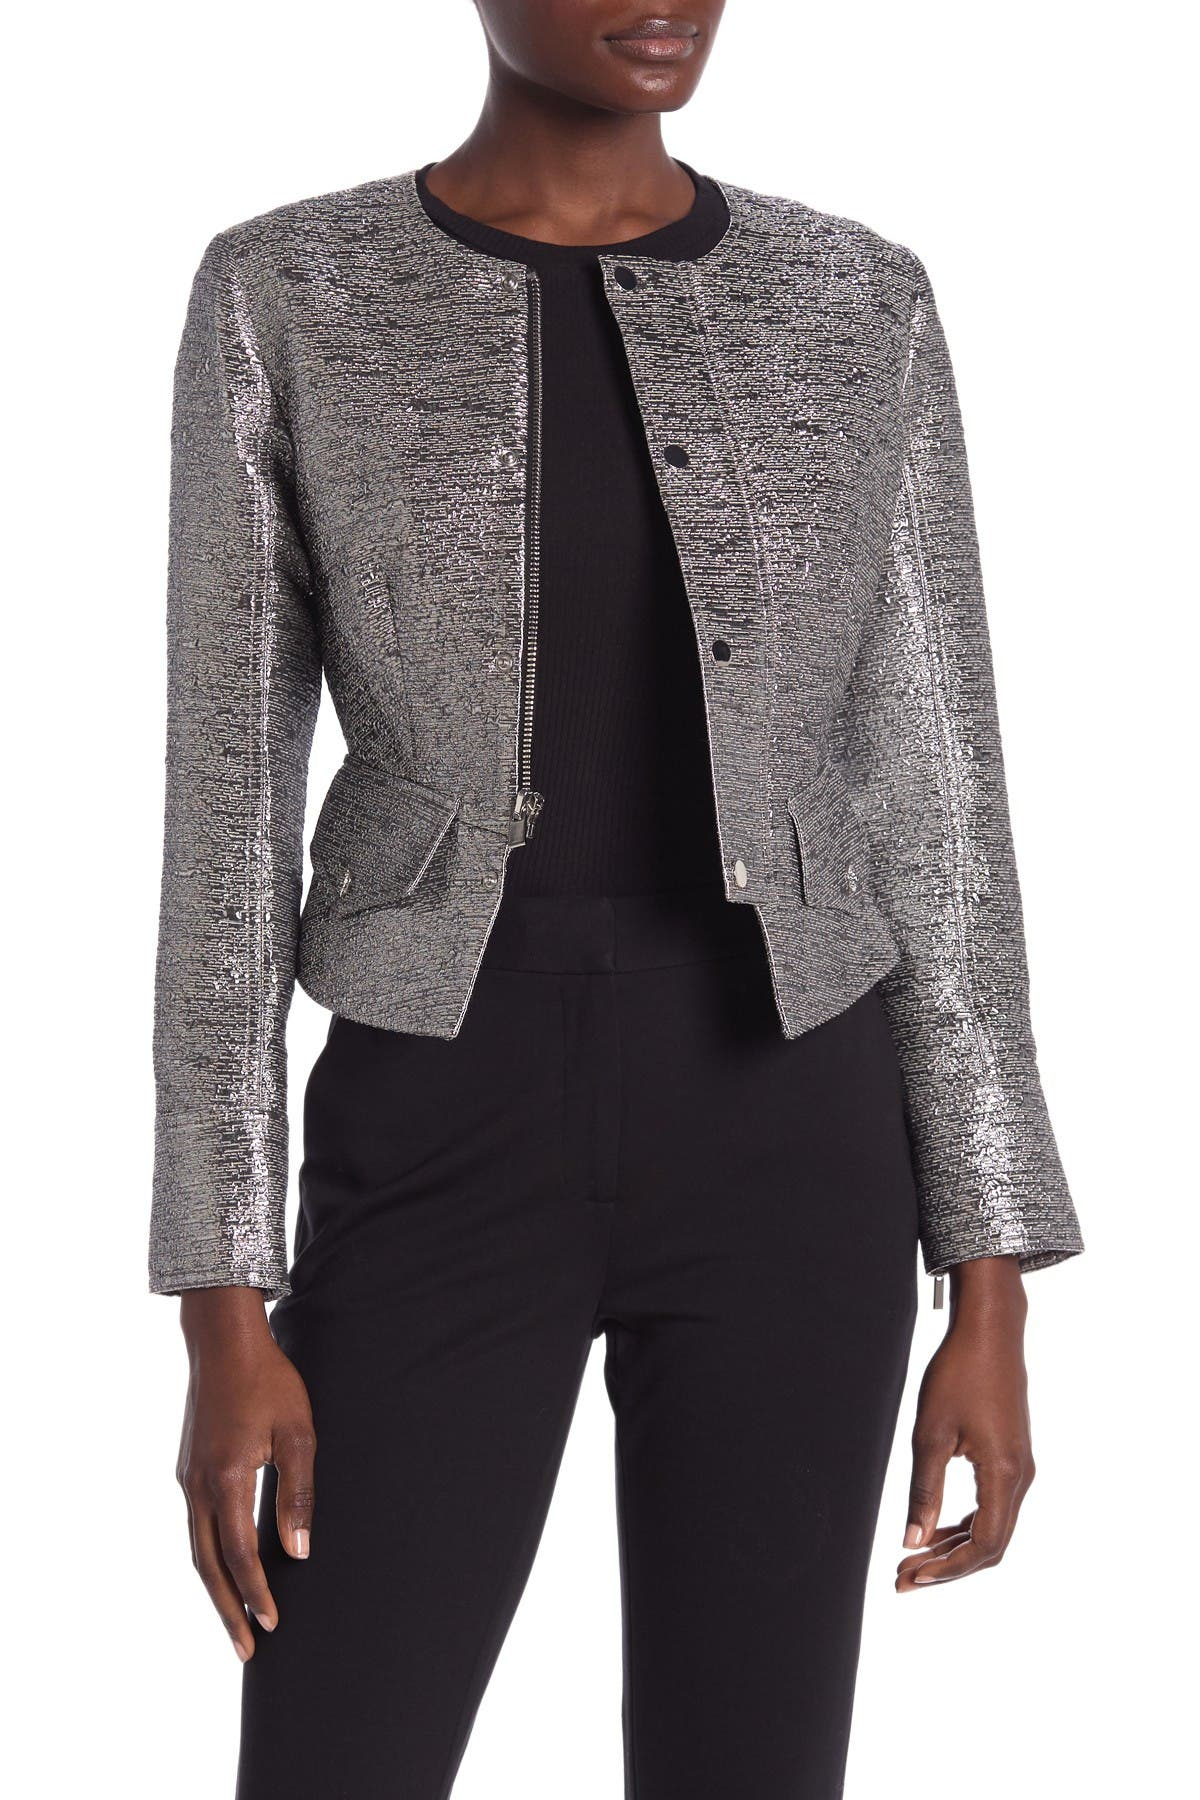 Image of Diane von Furstenberg Verena Metallic Jacket